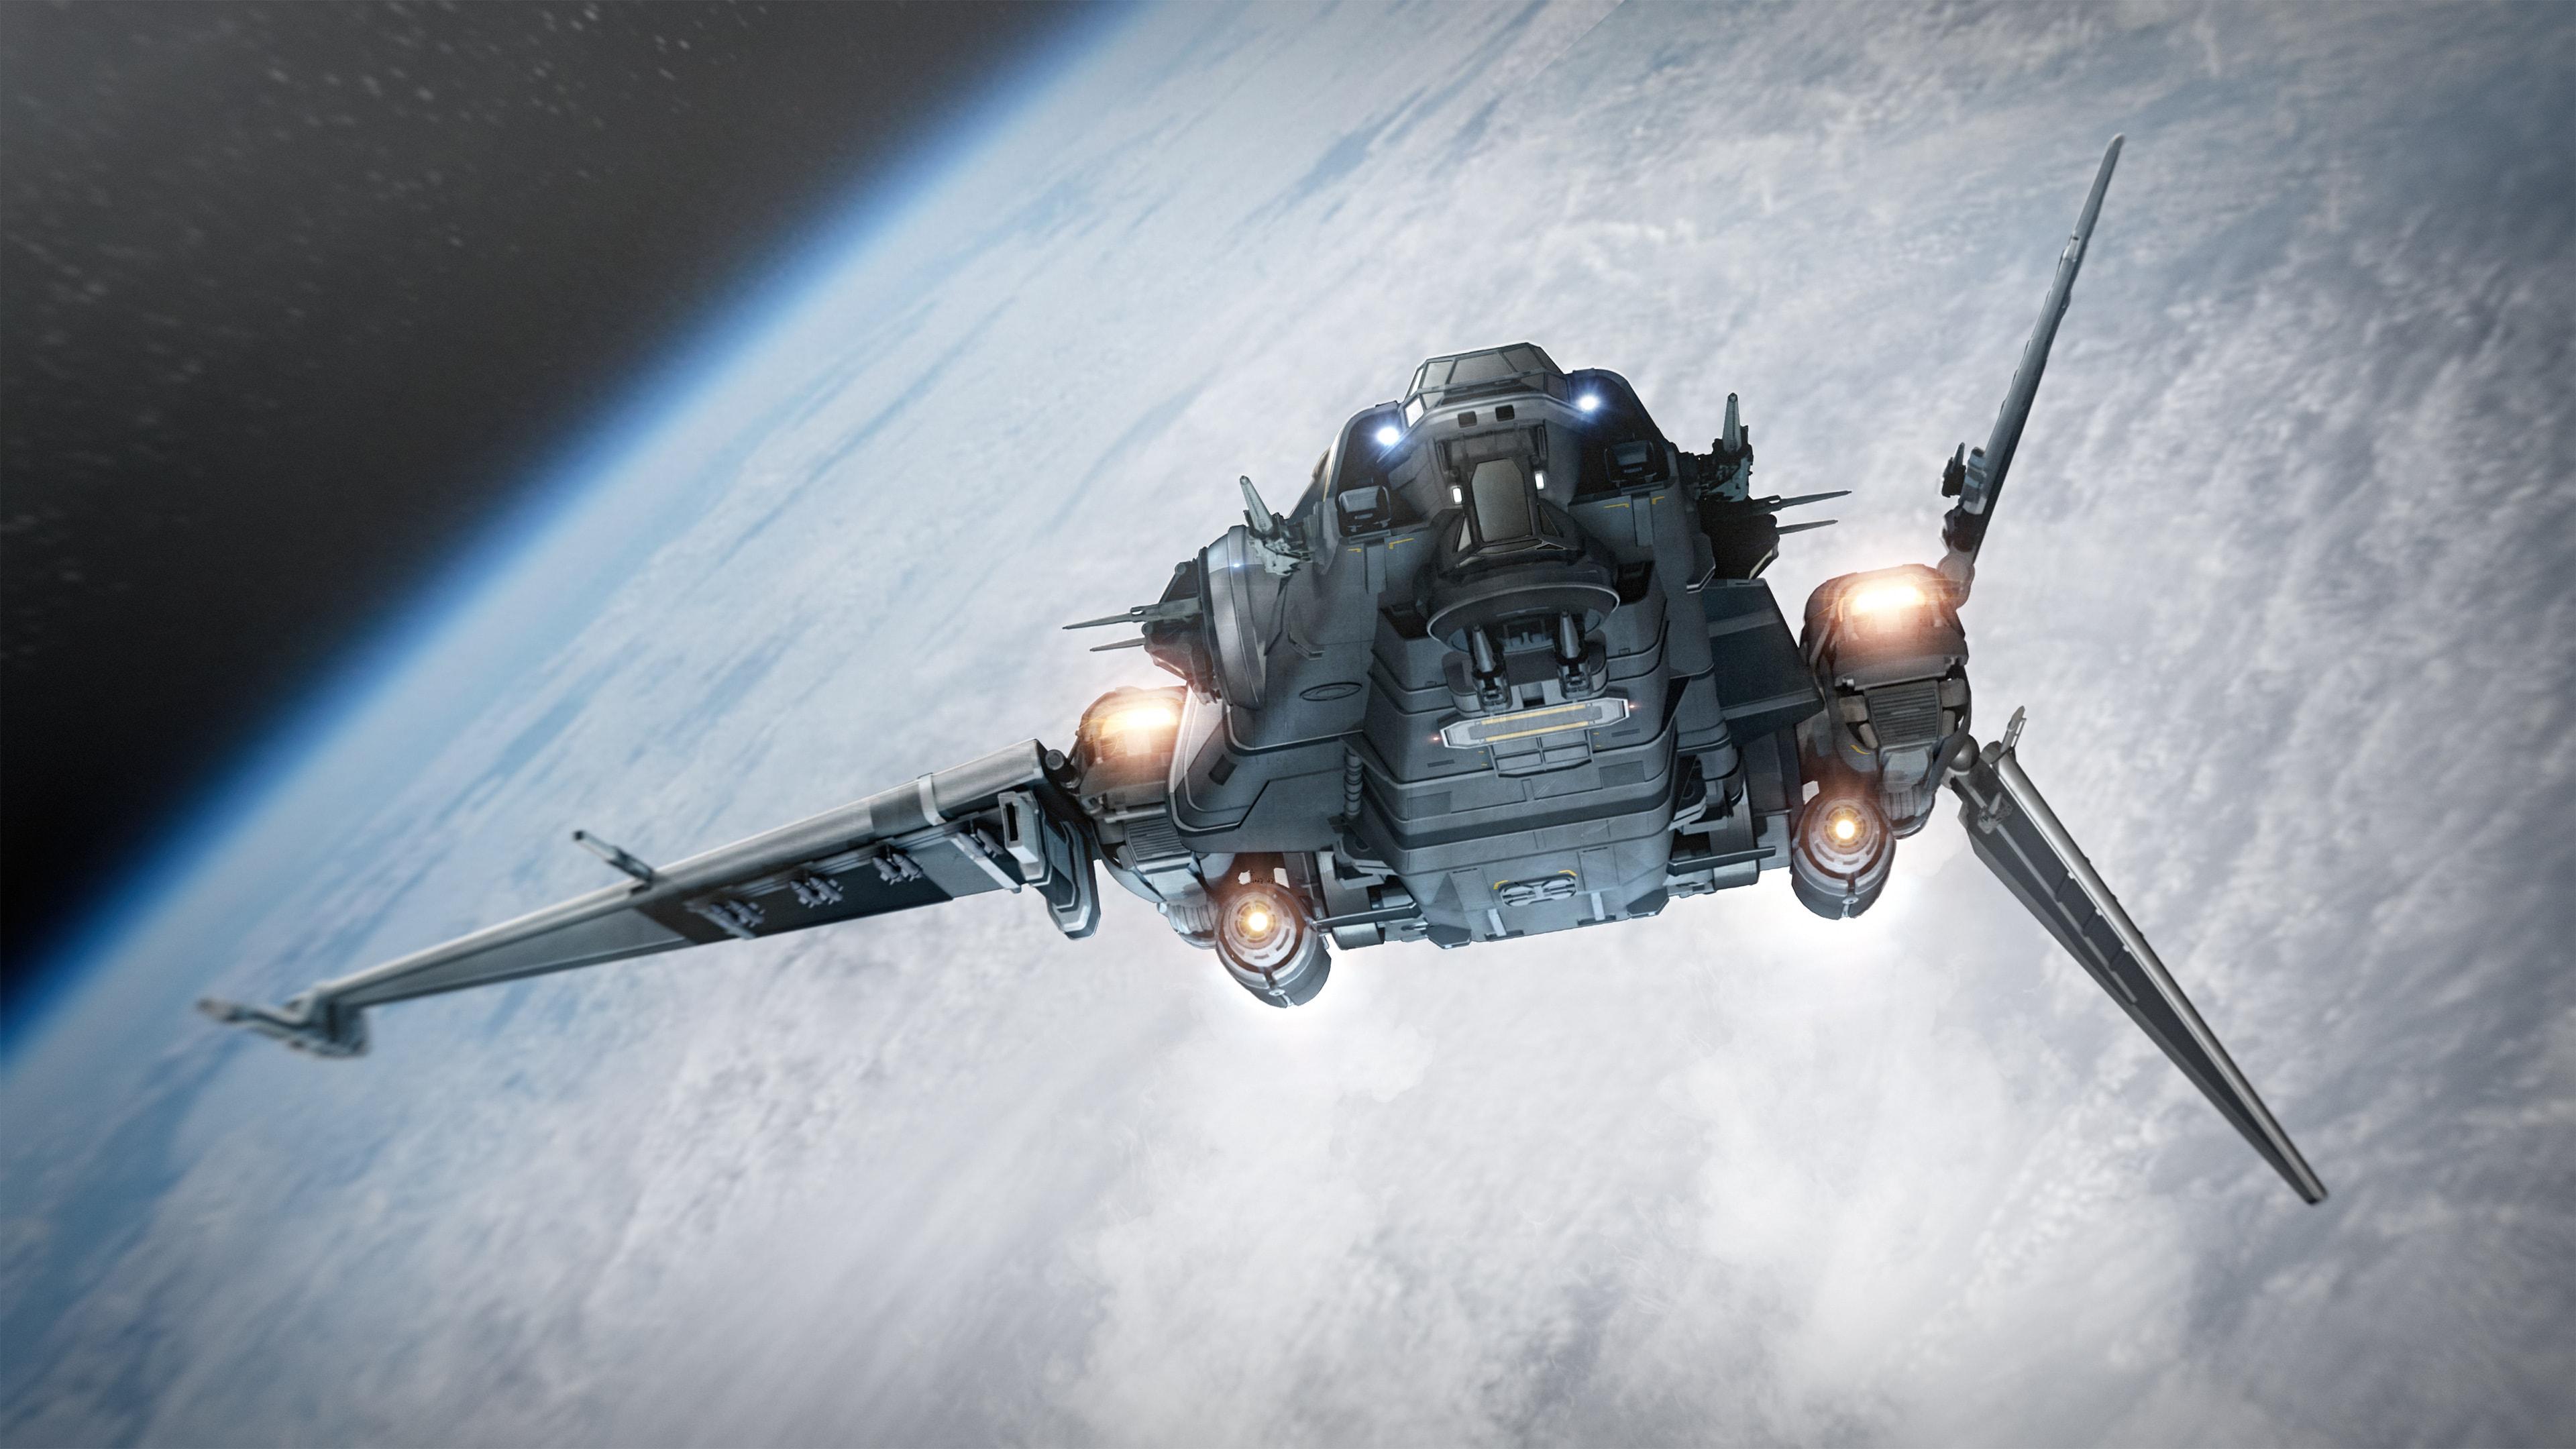 [Image: DRAK_Corsair_Promo_flight_upshot_JM_PJ01_CC-3-Min.jpg]